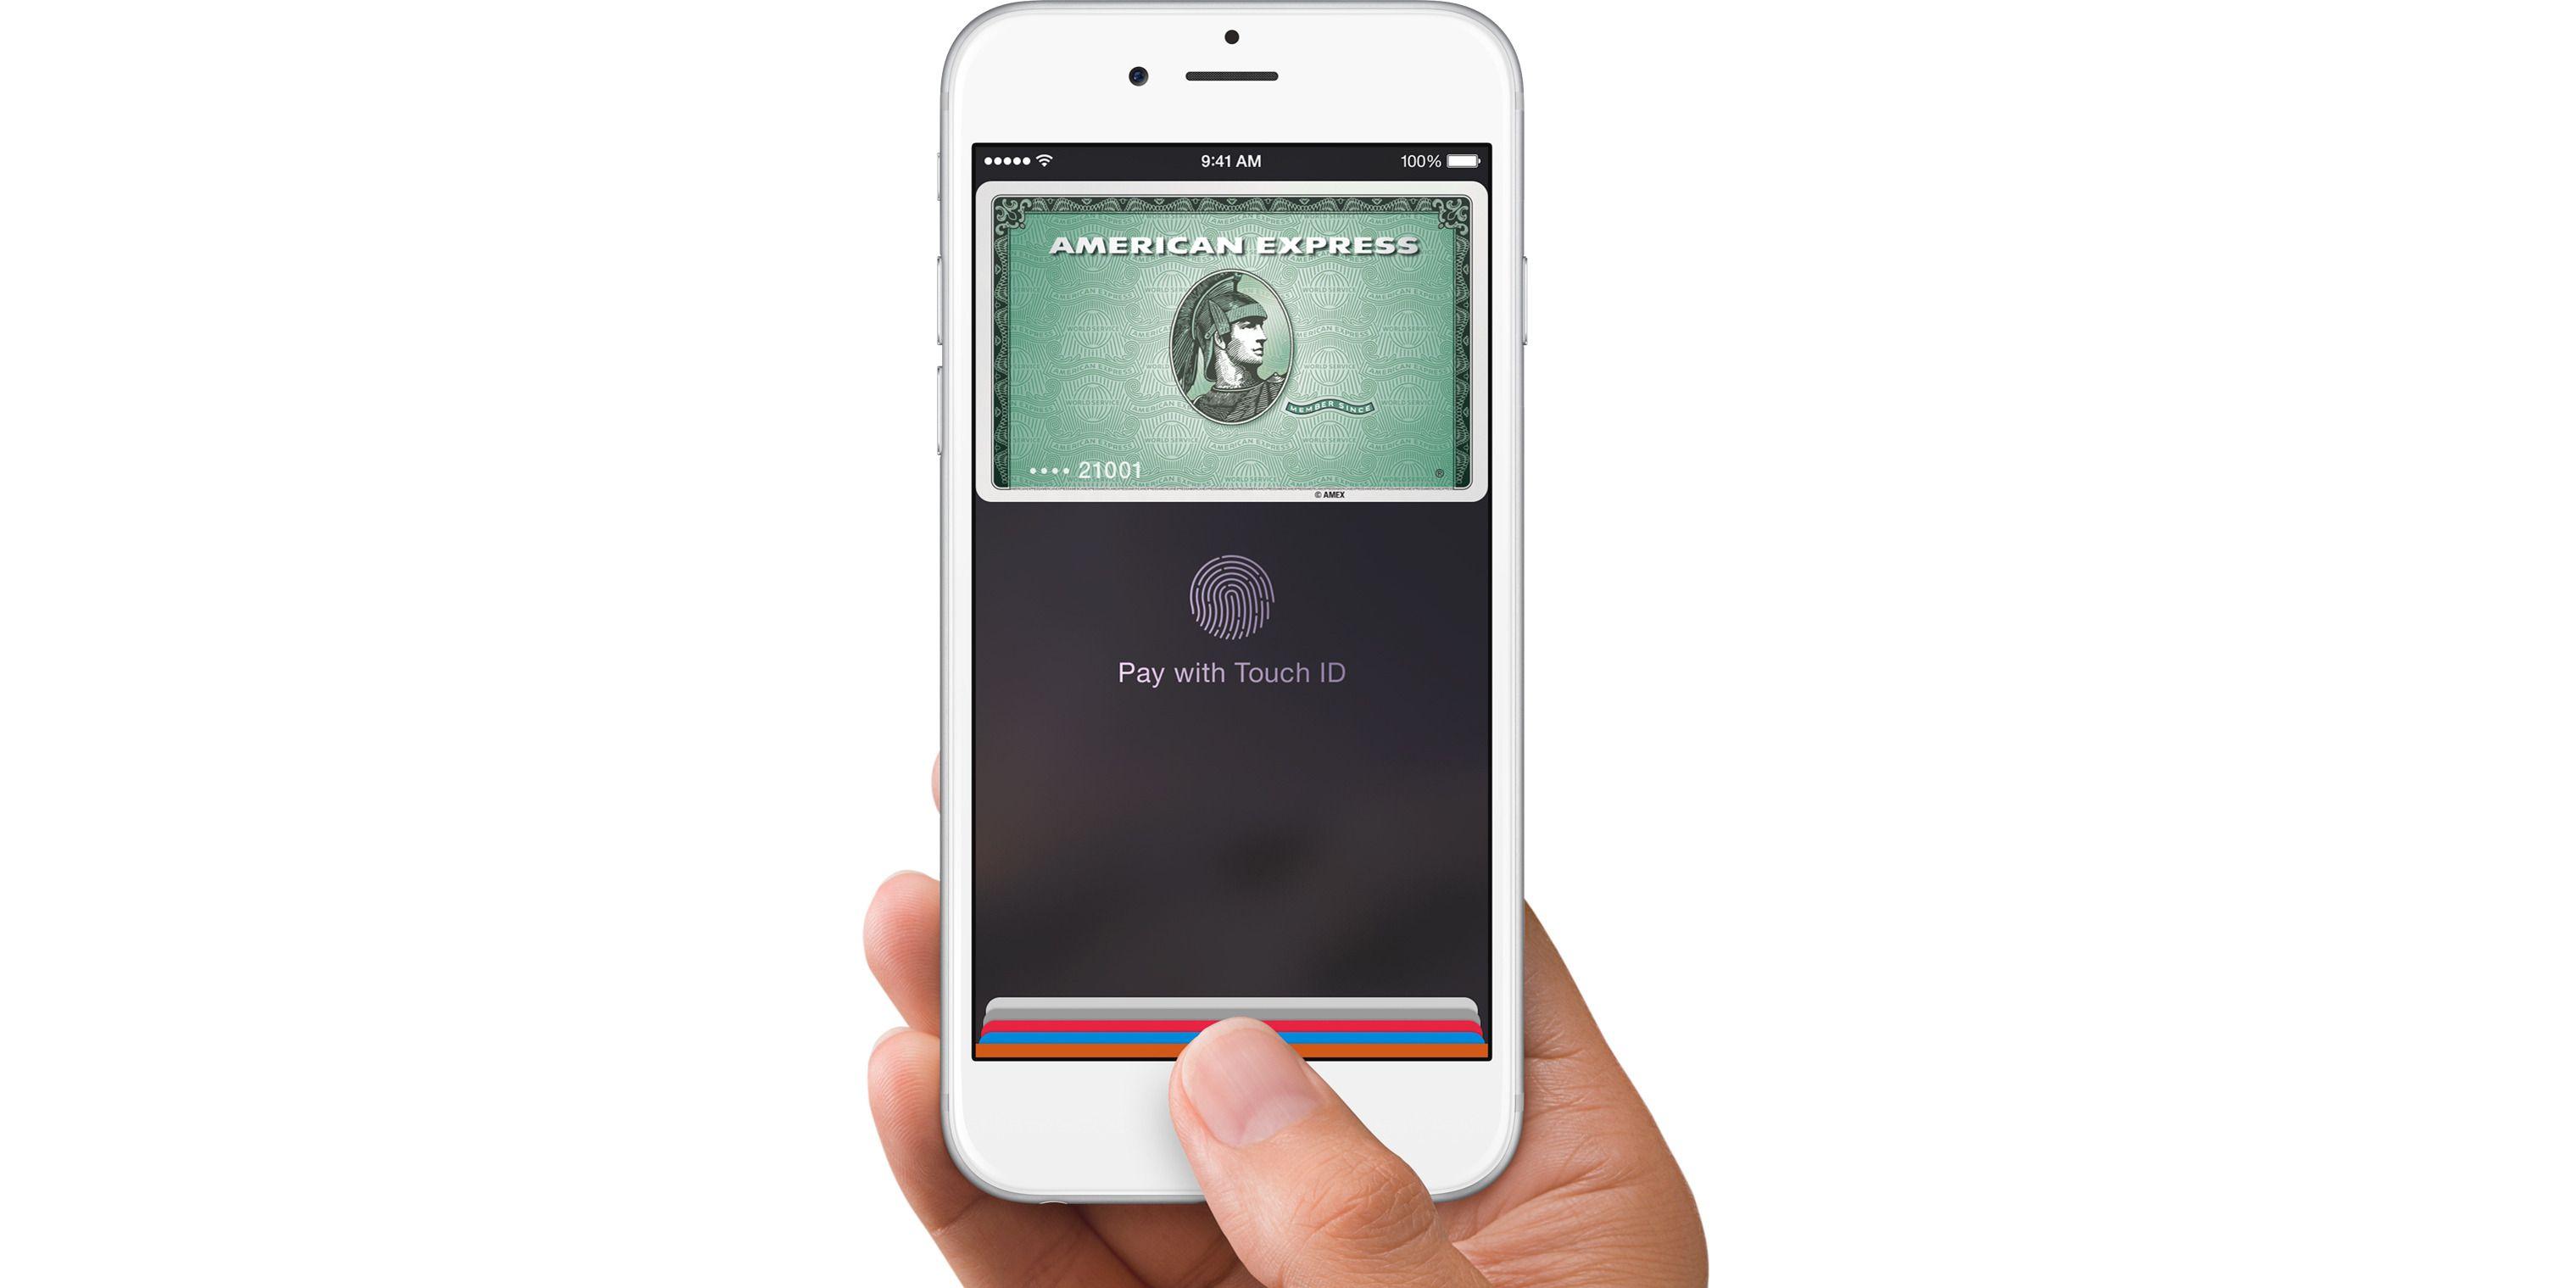 DNB-kunder kan se langt etter Apple Pay